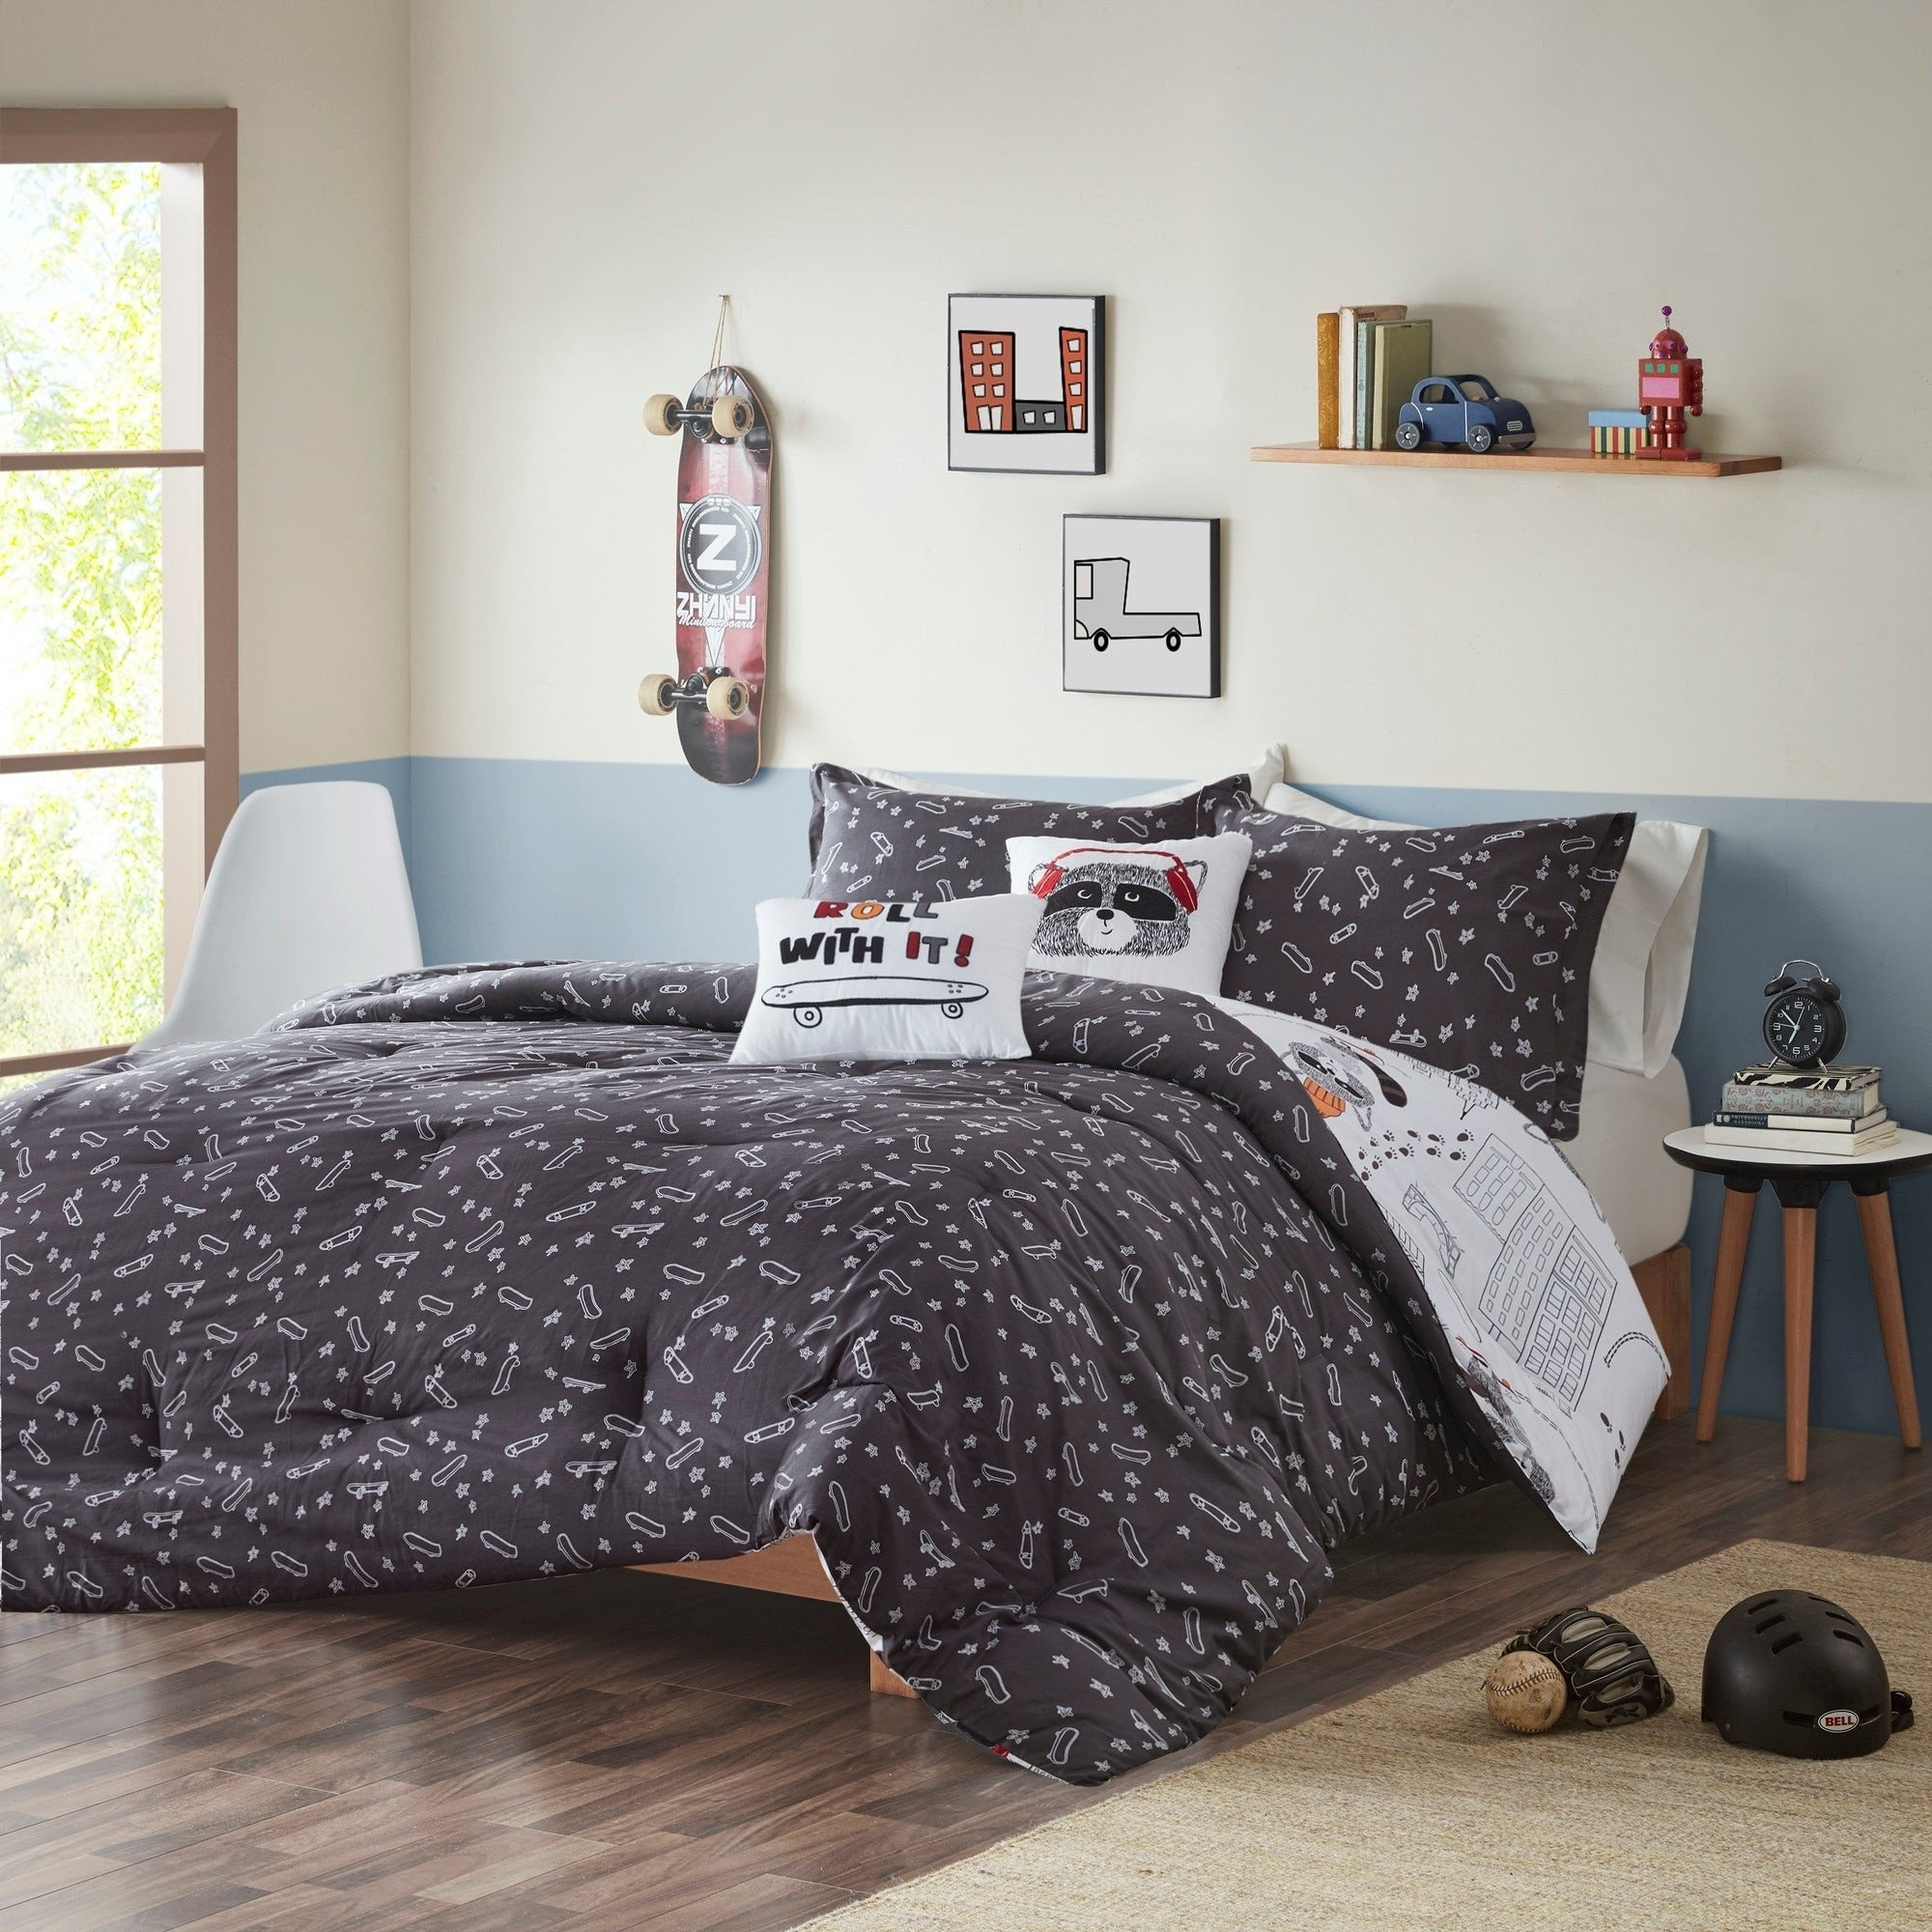 Black Bedroom Comforter Set Beautiful Urban Habitat Kids Cody Black Multi Cotton Reversible forter Set